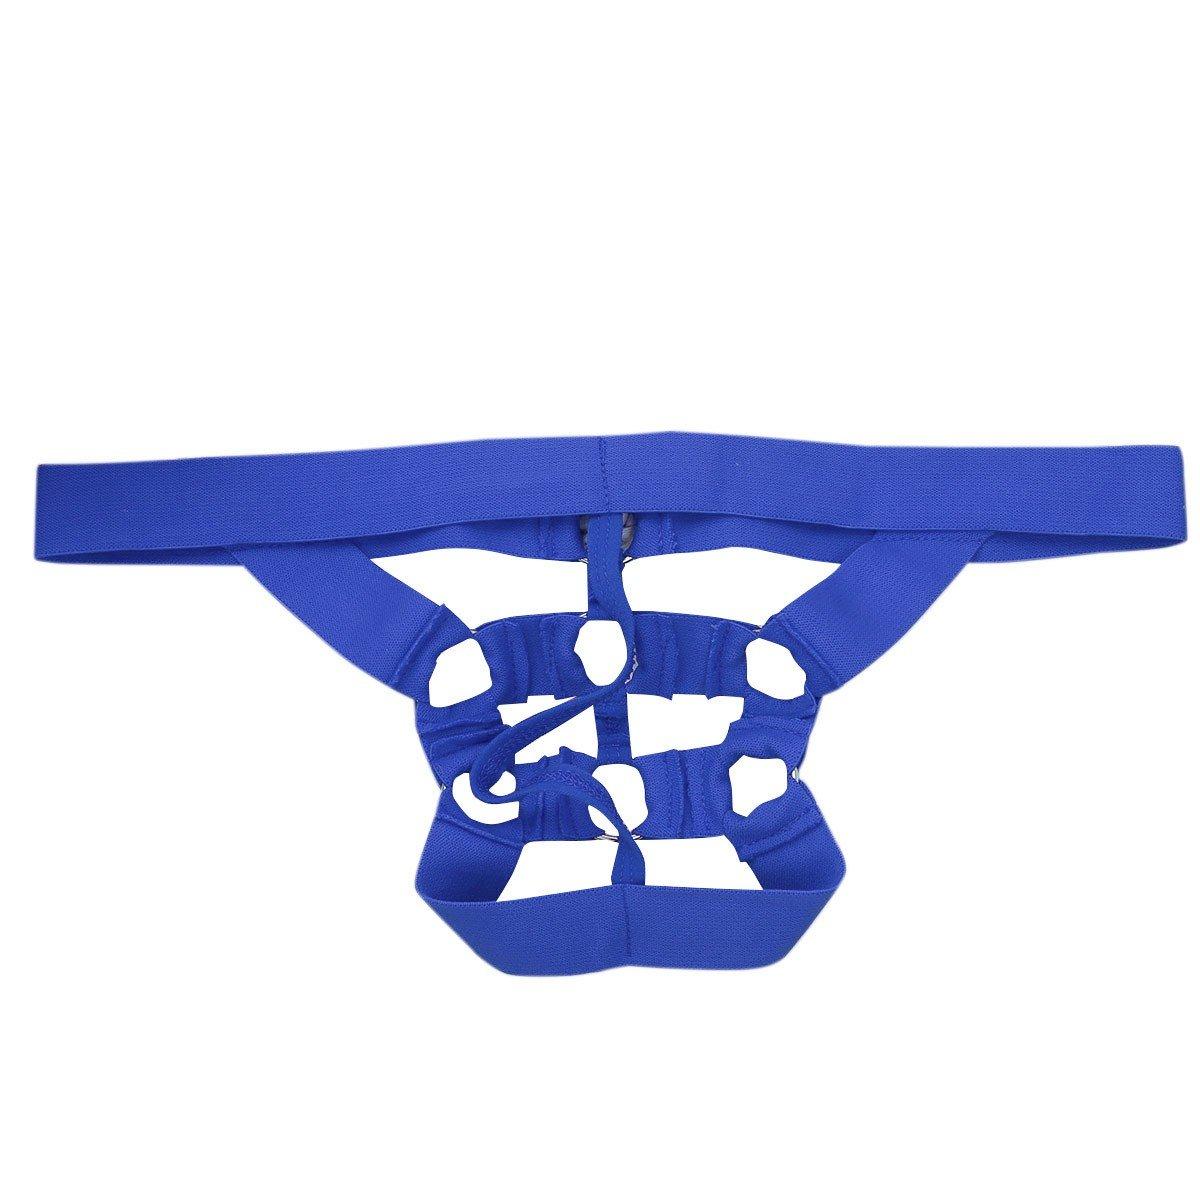 YIZYIF Tanga Hombre Slip Ropa Interior Masculino Slips Para Hombres Ropa De Dormir Azul Talla Única: Amazon.es: Ropa y accesorios